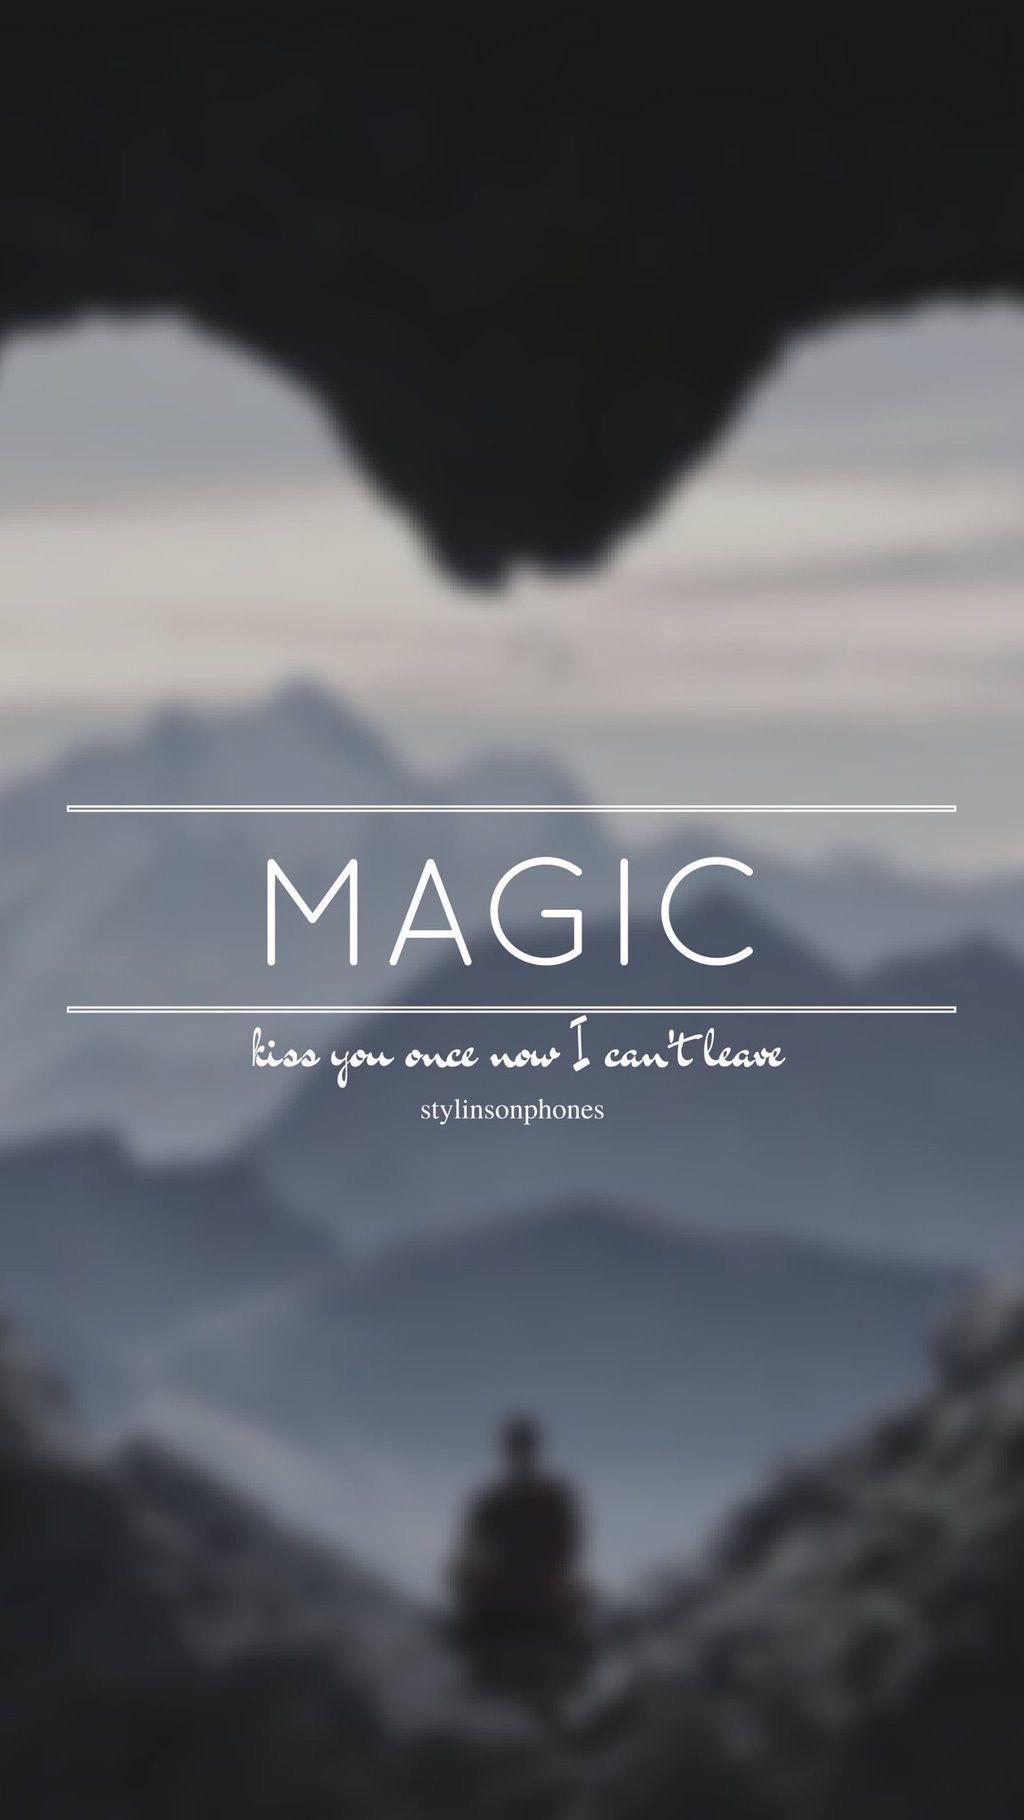 One magic kiss lyrics